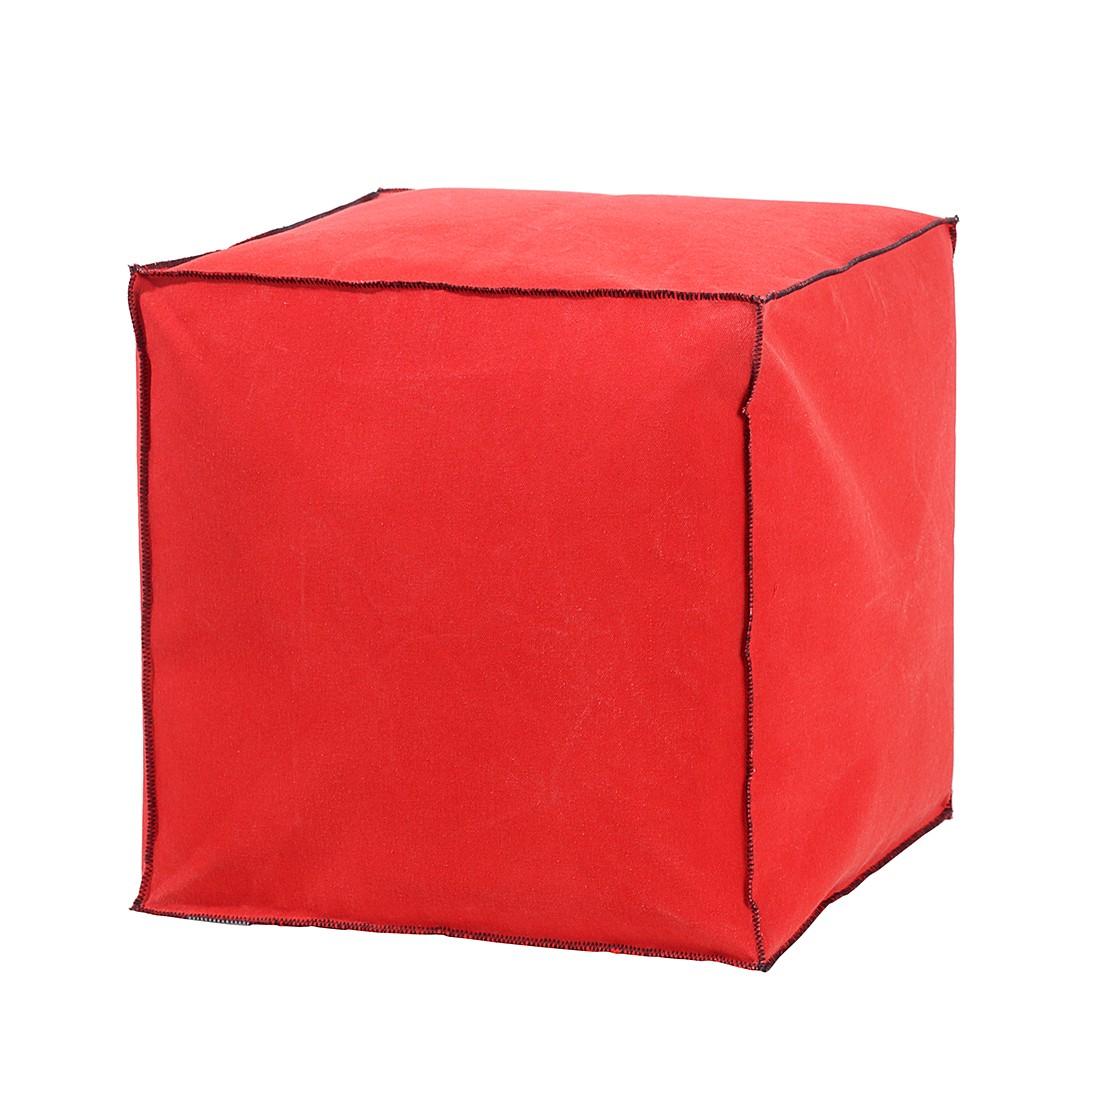 Sitzwürfel Otto – Rot, Serax jetzt kaufen